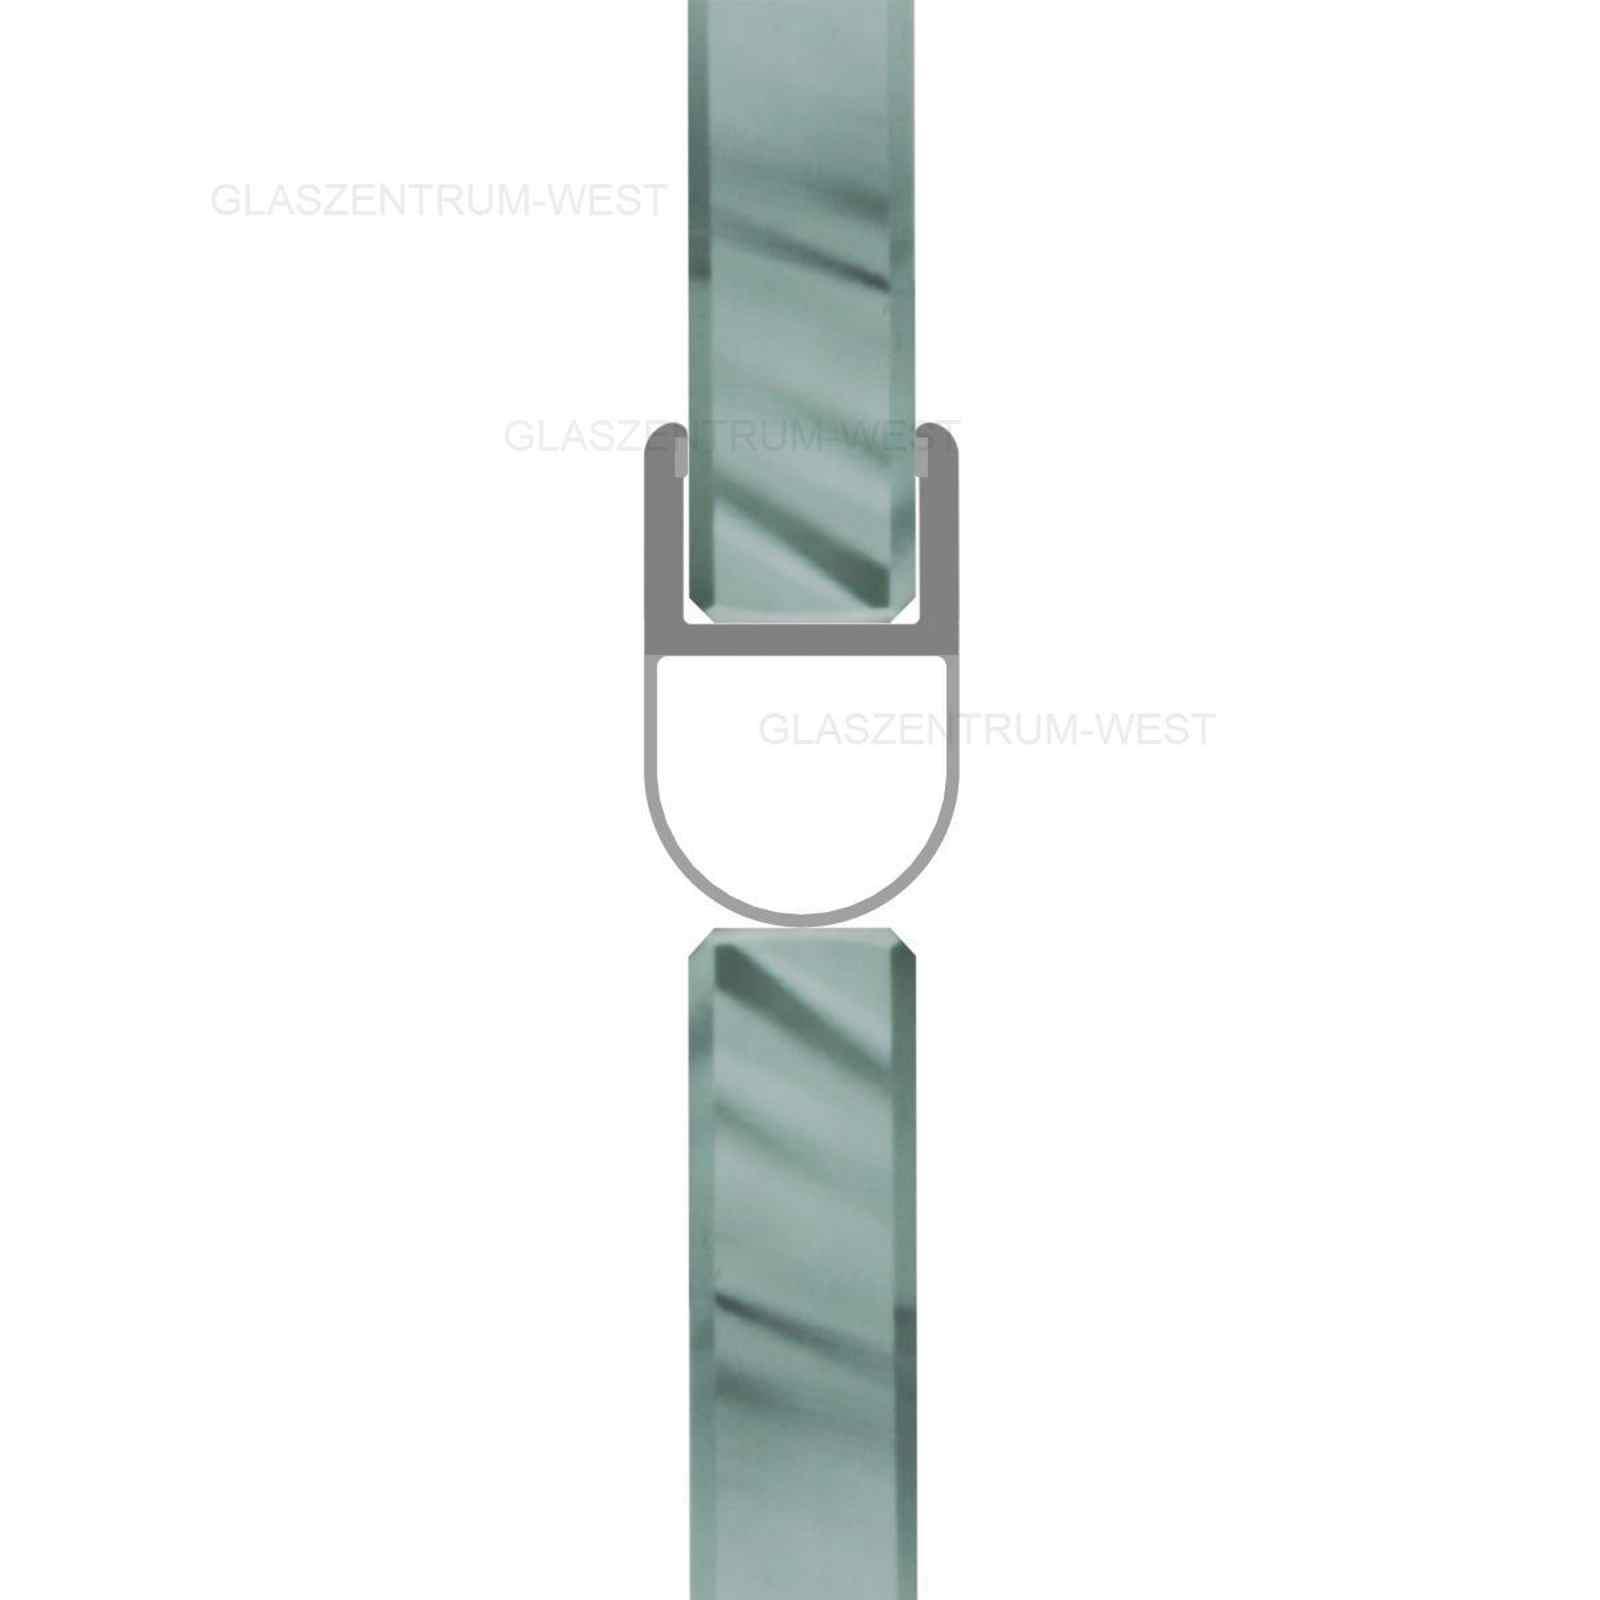 duschdichtung streifdichtung balgdichtung dusche profil glas 6 mm 30cm 2m eur 4 20. Black Bedroom Furniture Sets. Home Design Ideas